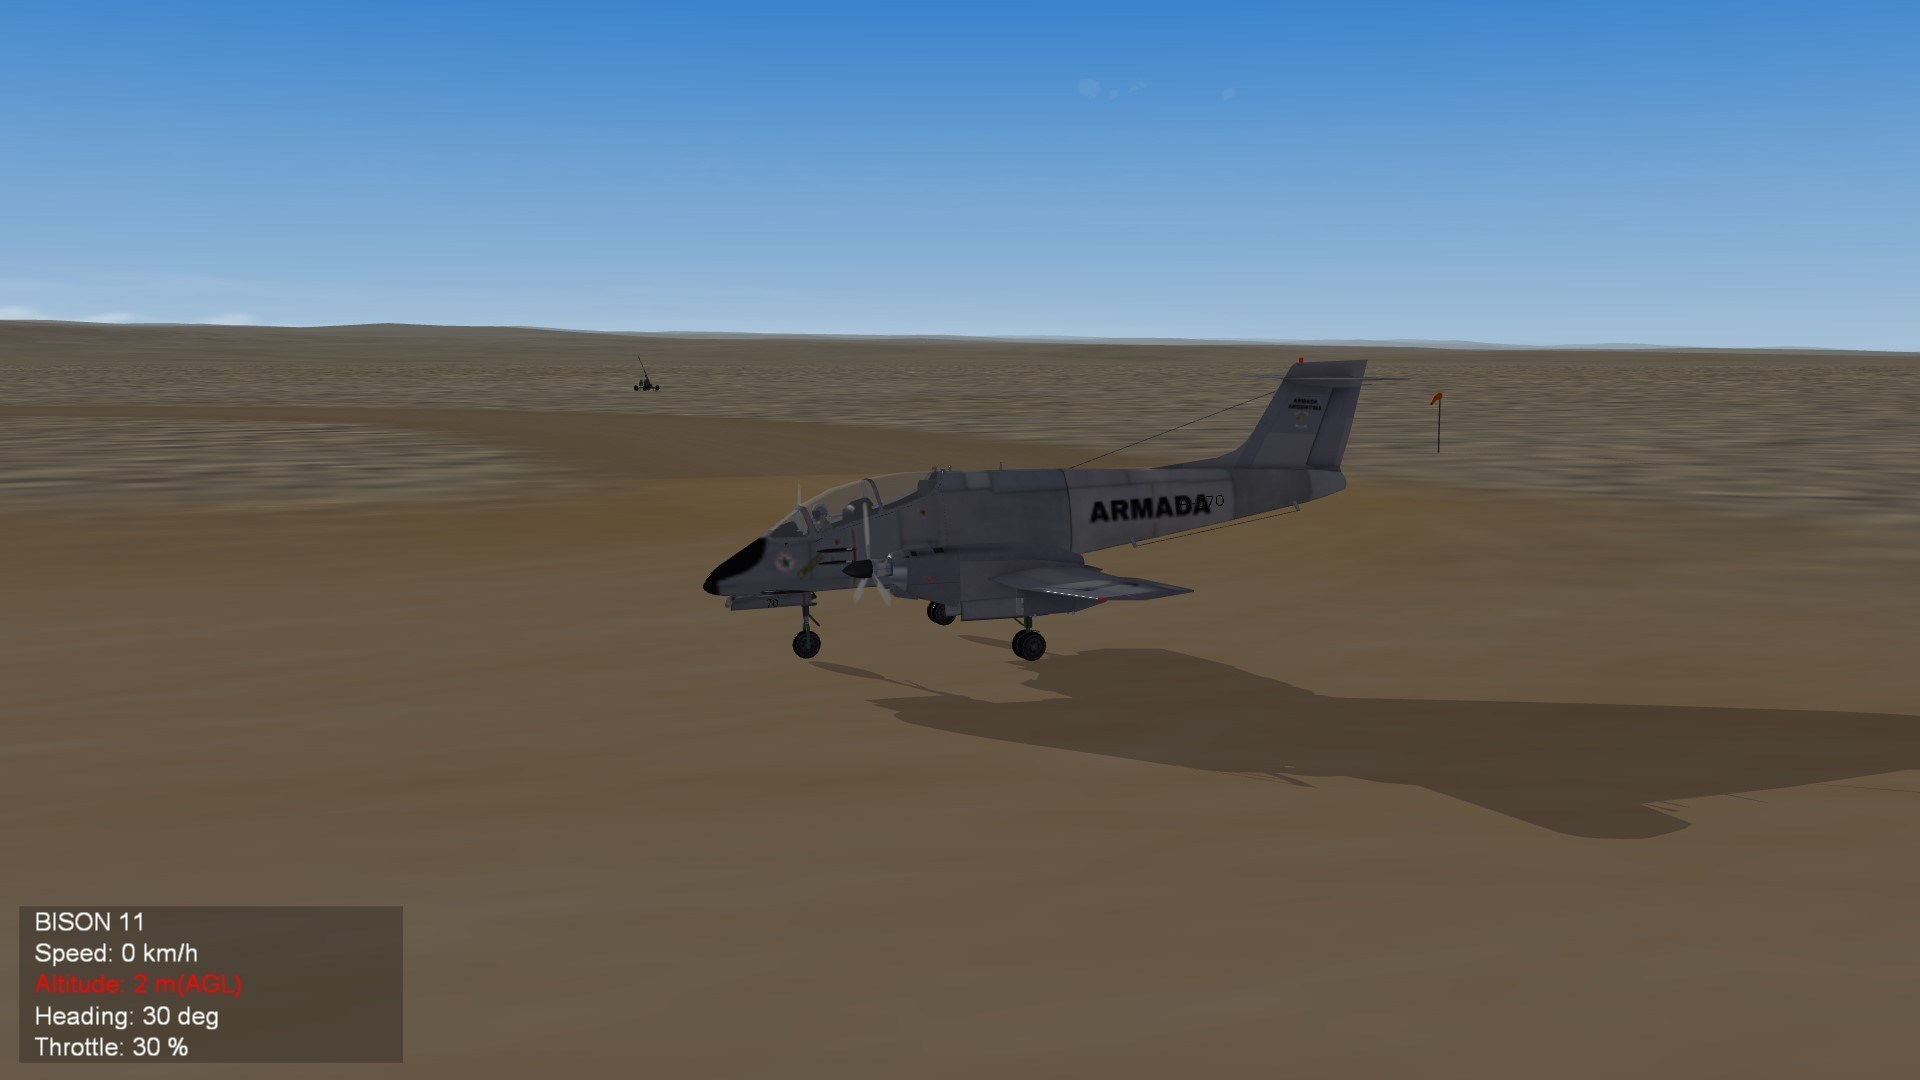 FMA IA-58 Pucara Armada Argentina (Fictional)